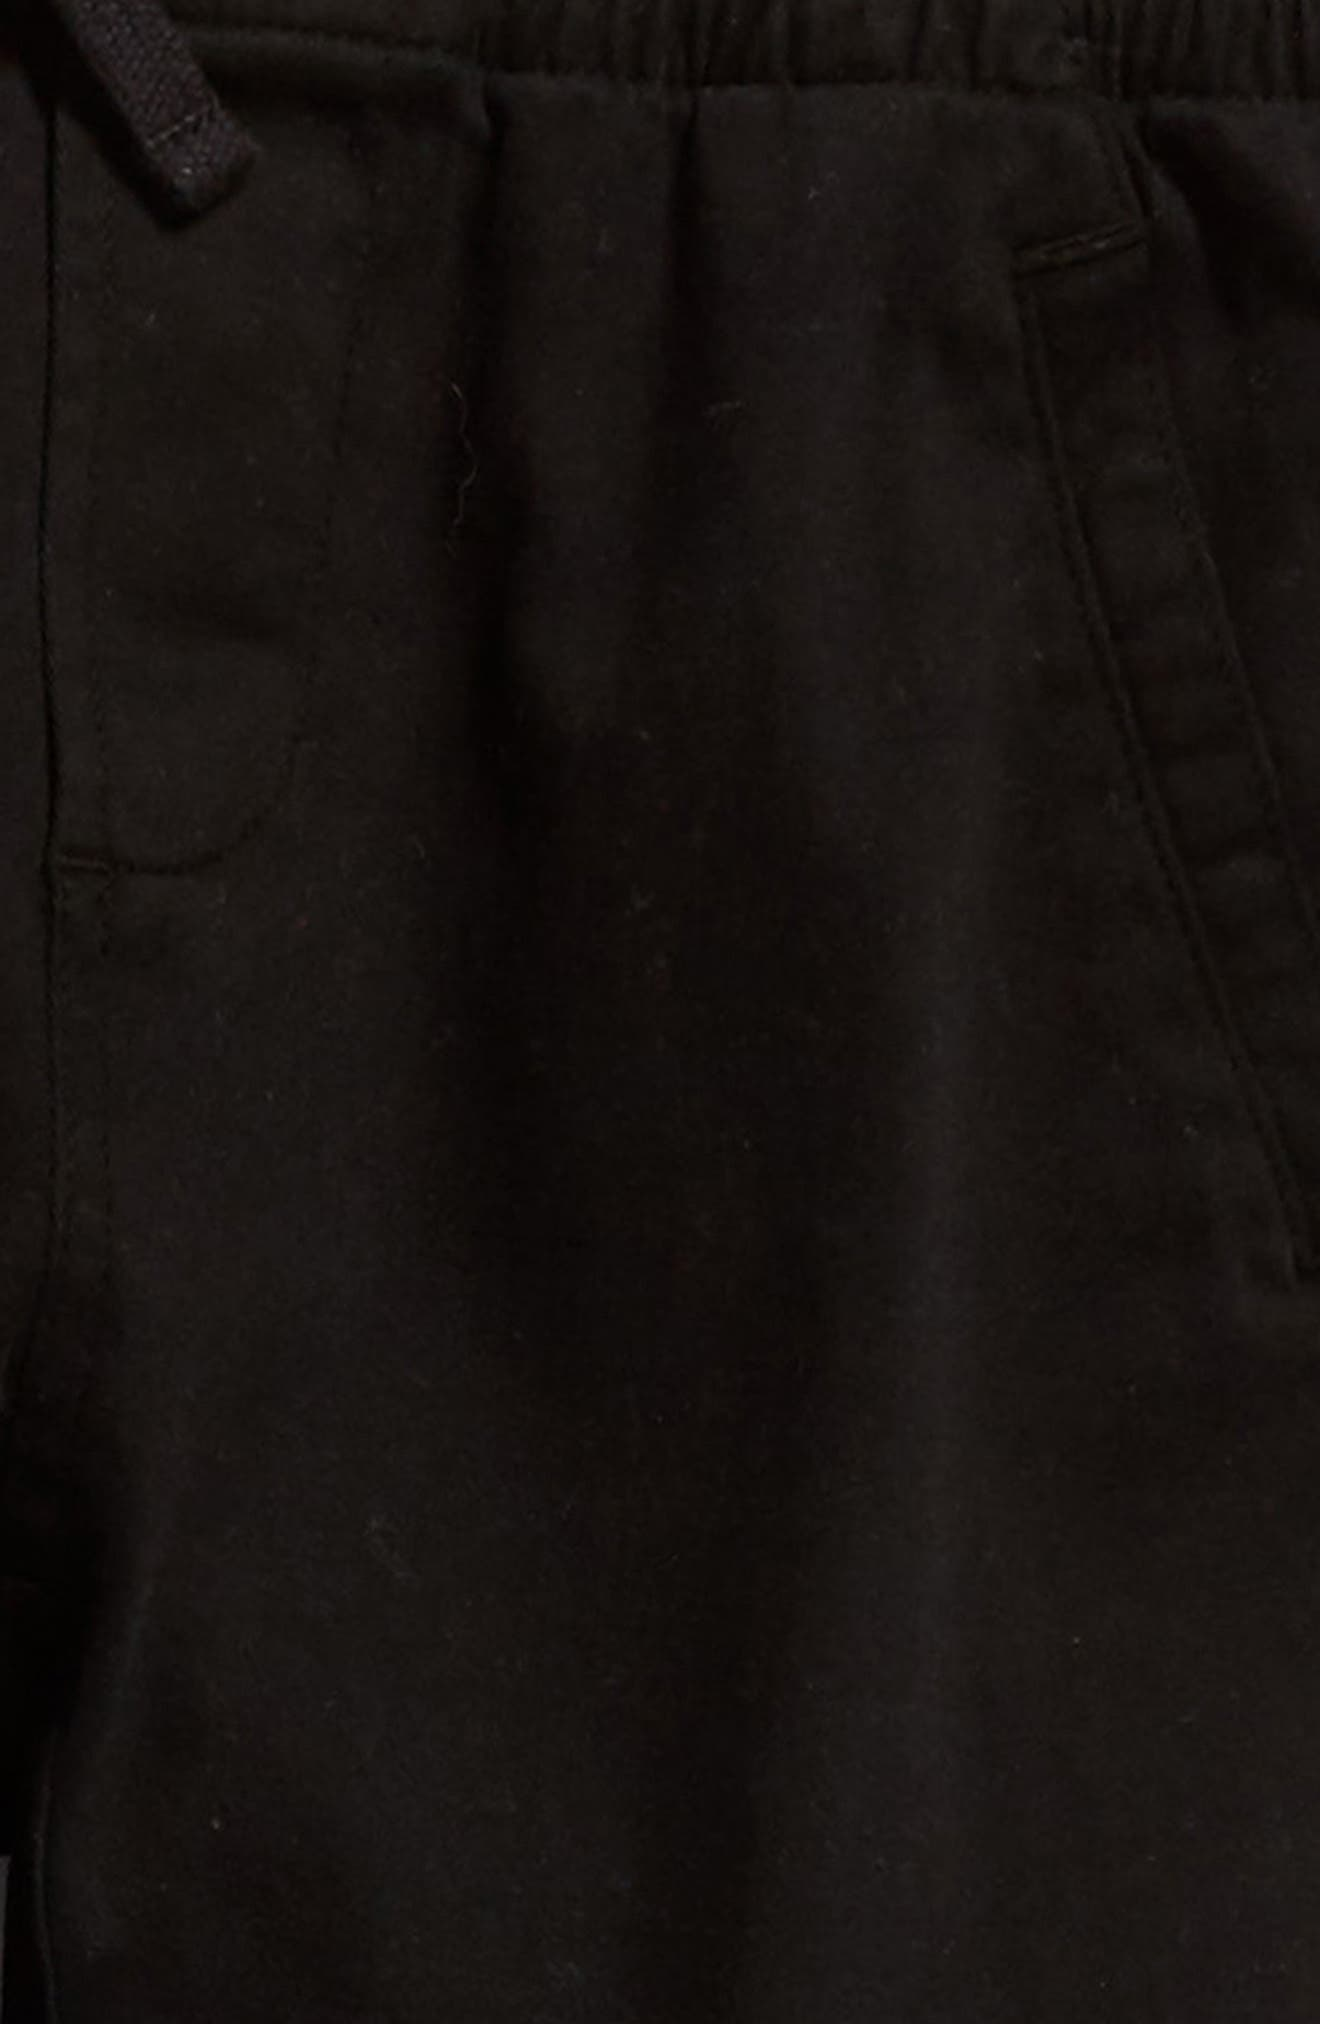 Washed Sweatpants,                             Alternate thumbnail 3, color,                             001